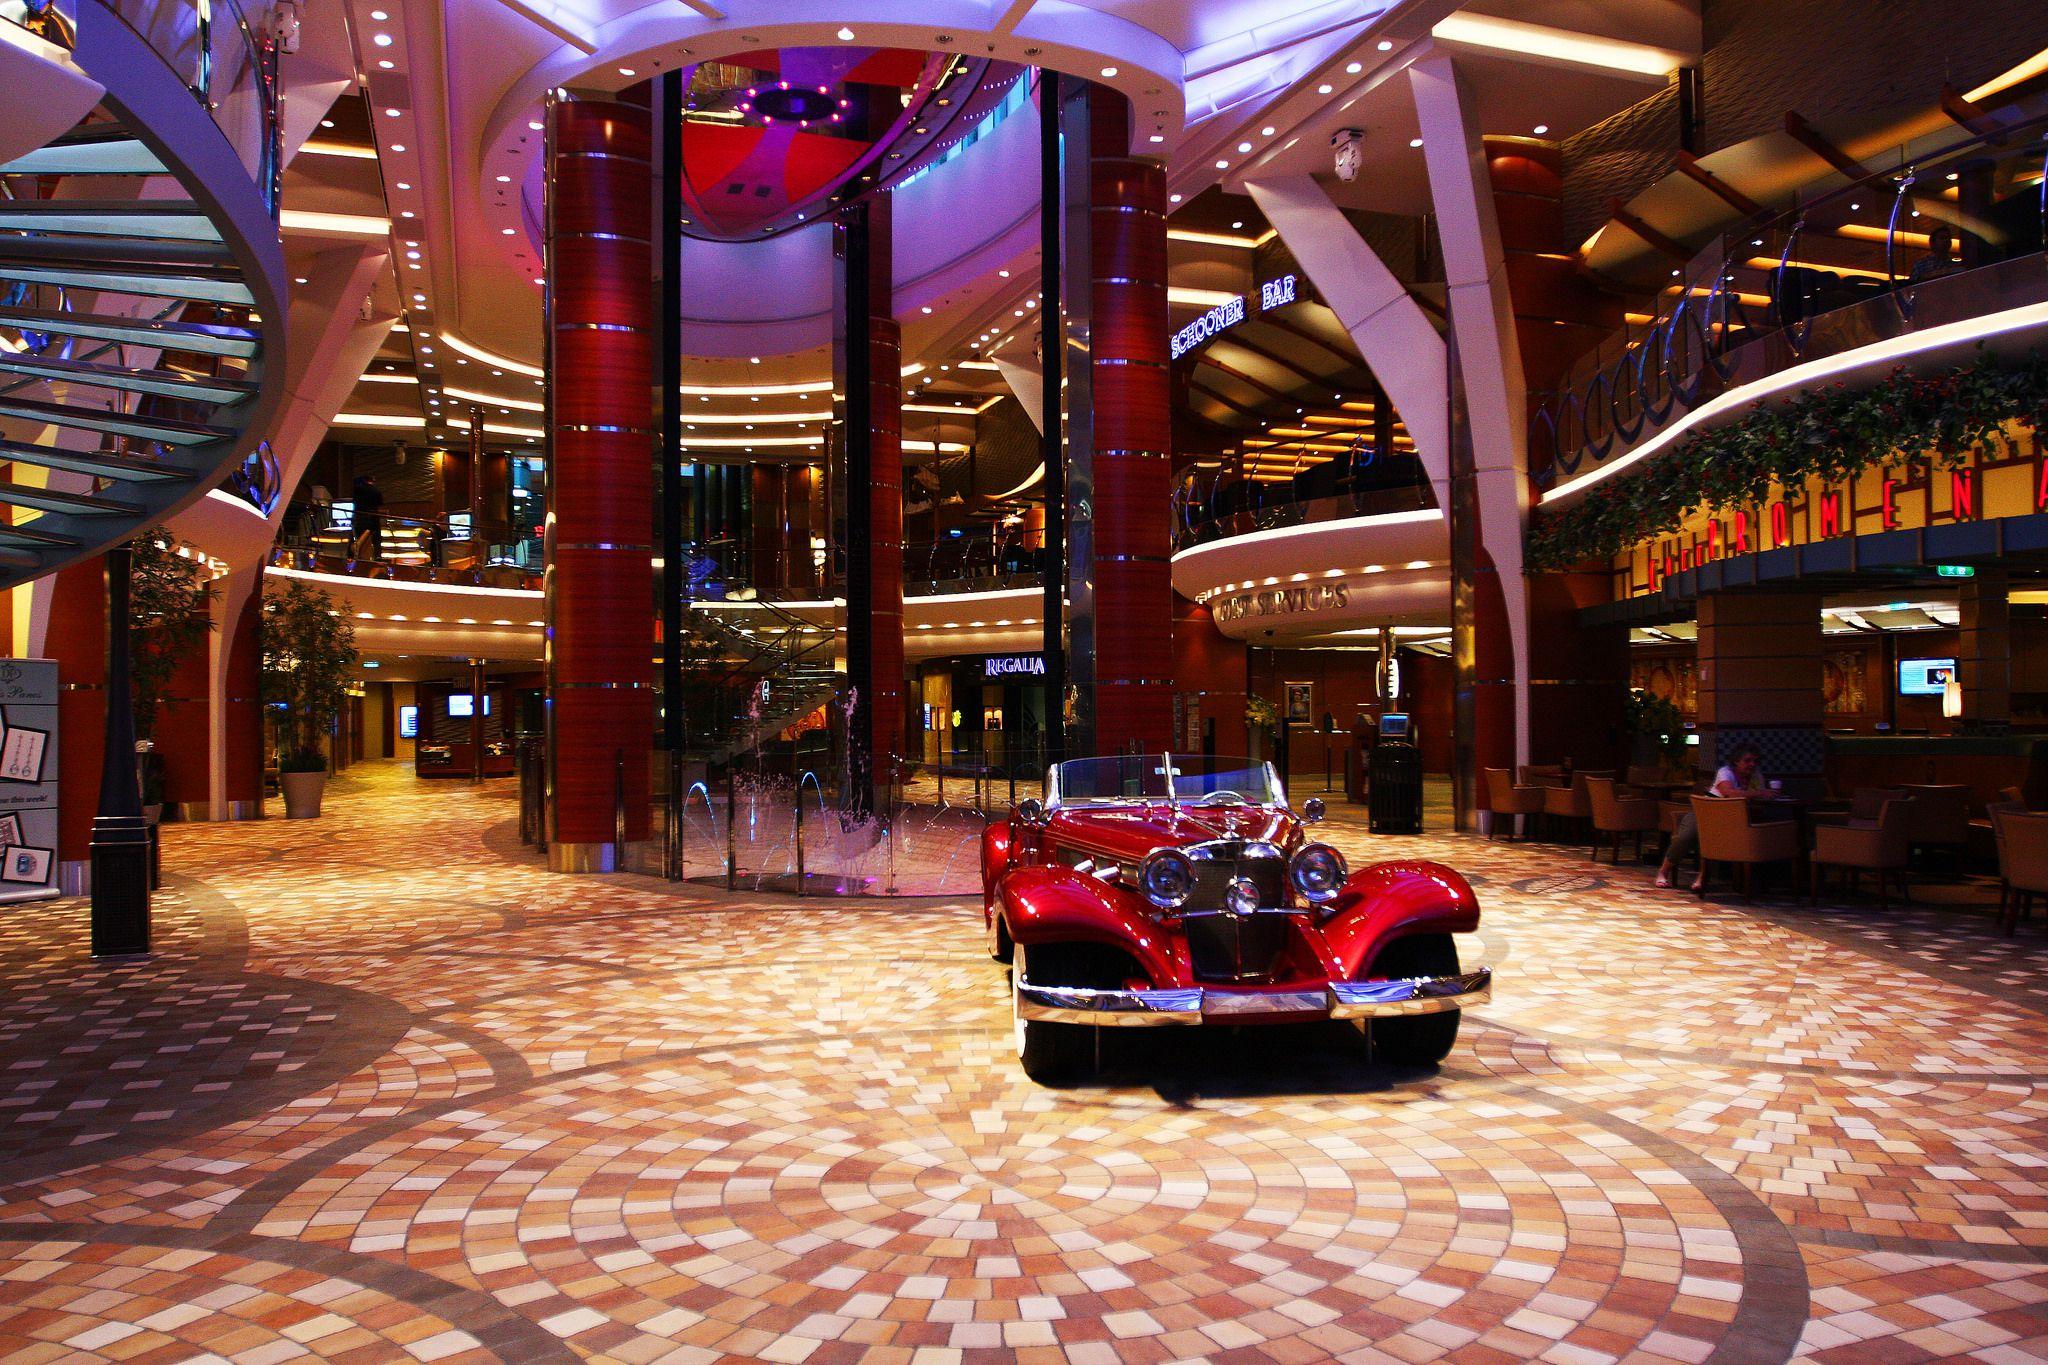 Allure Of The Seas Cruise Ship Interiors